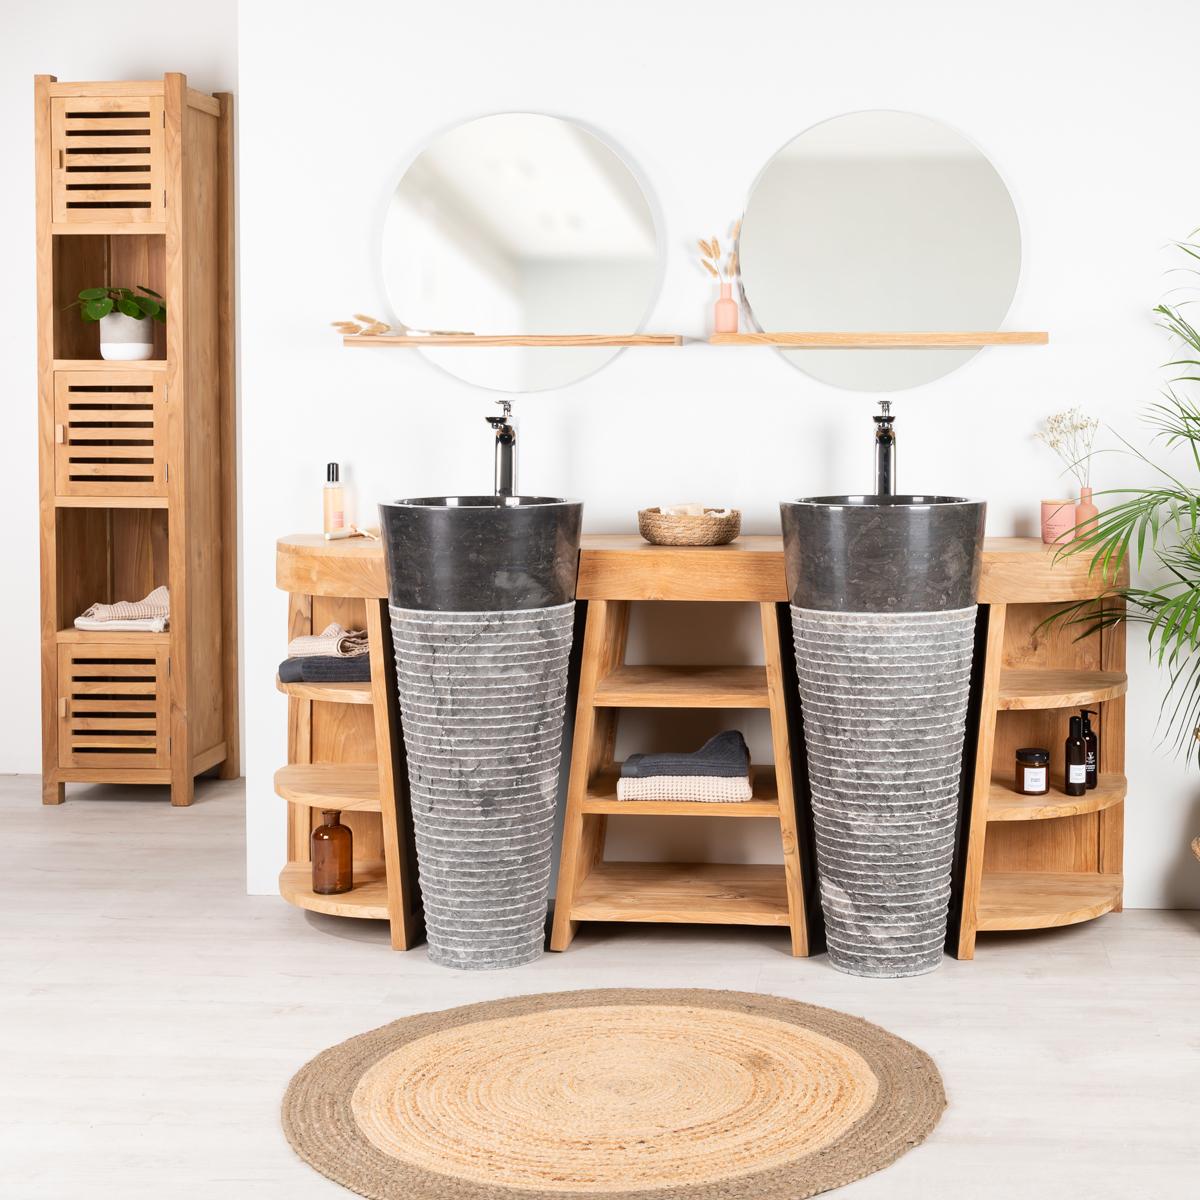 Meuble de salle de bain en teck Florence double 180cm + vasques noir